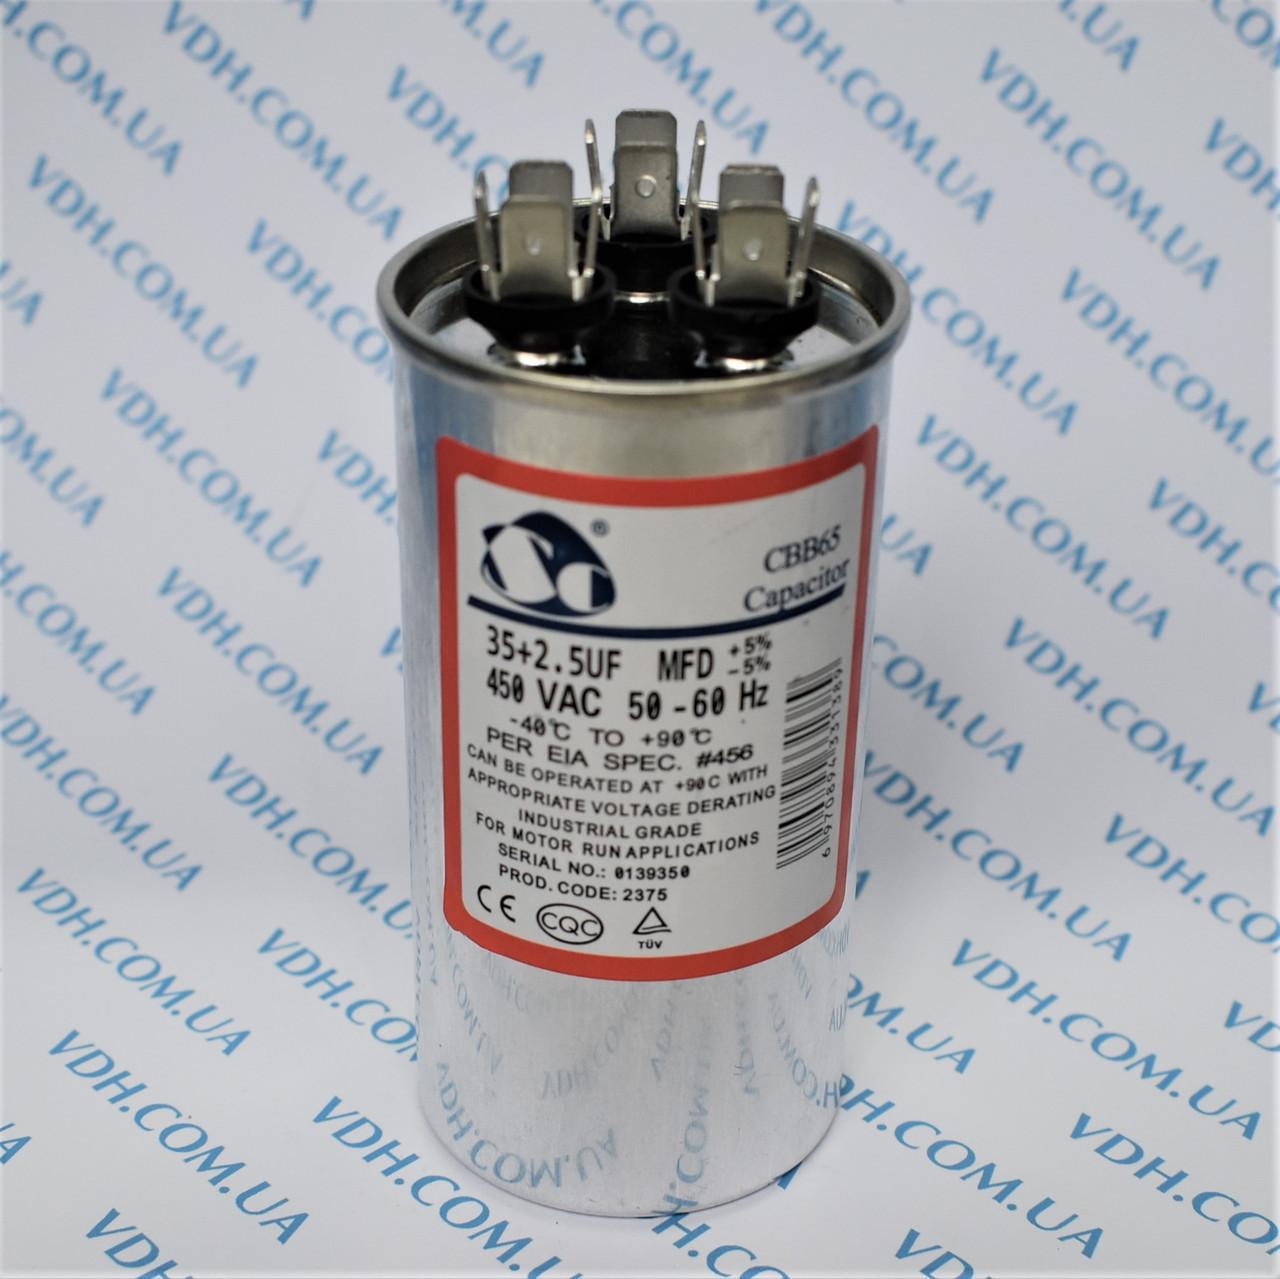 Електричний конденсатор 60 + 1,5 мкФ